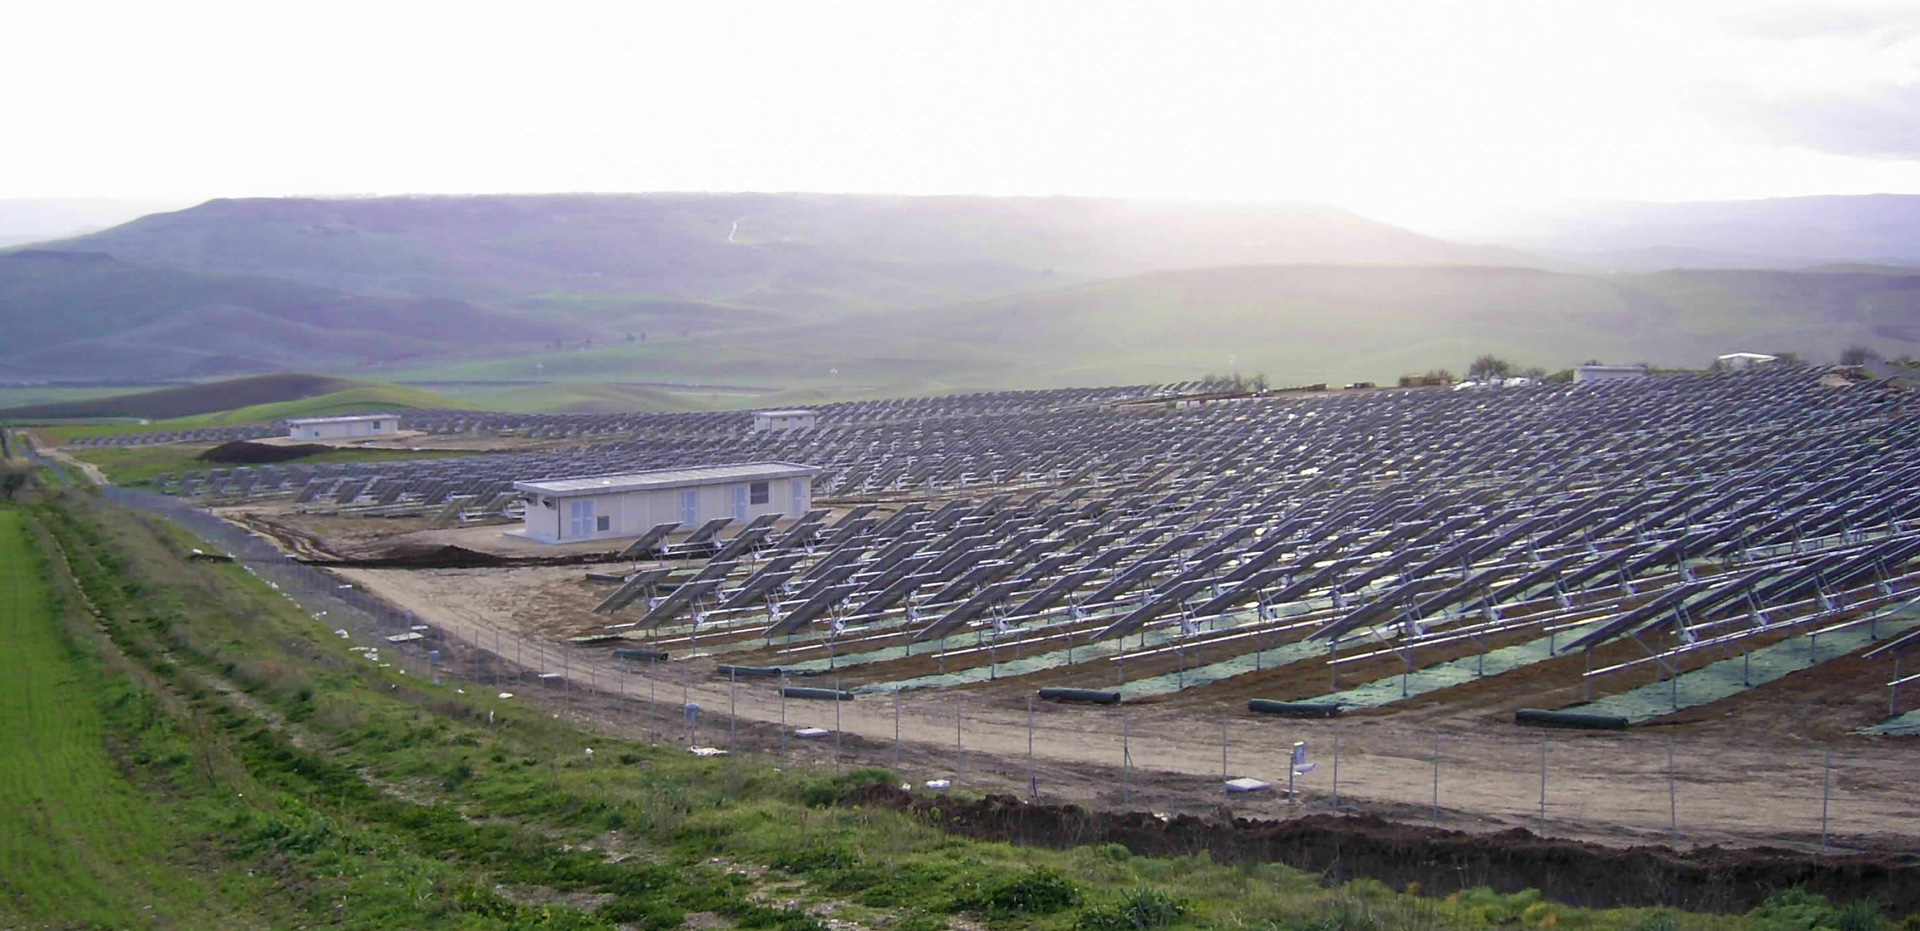 Parco eolico energia solare